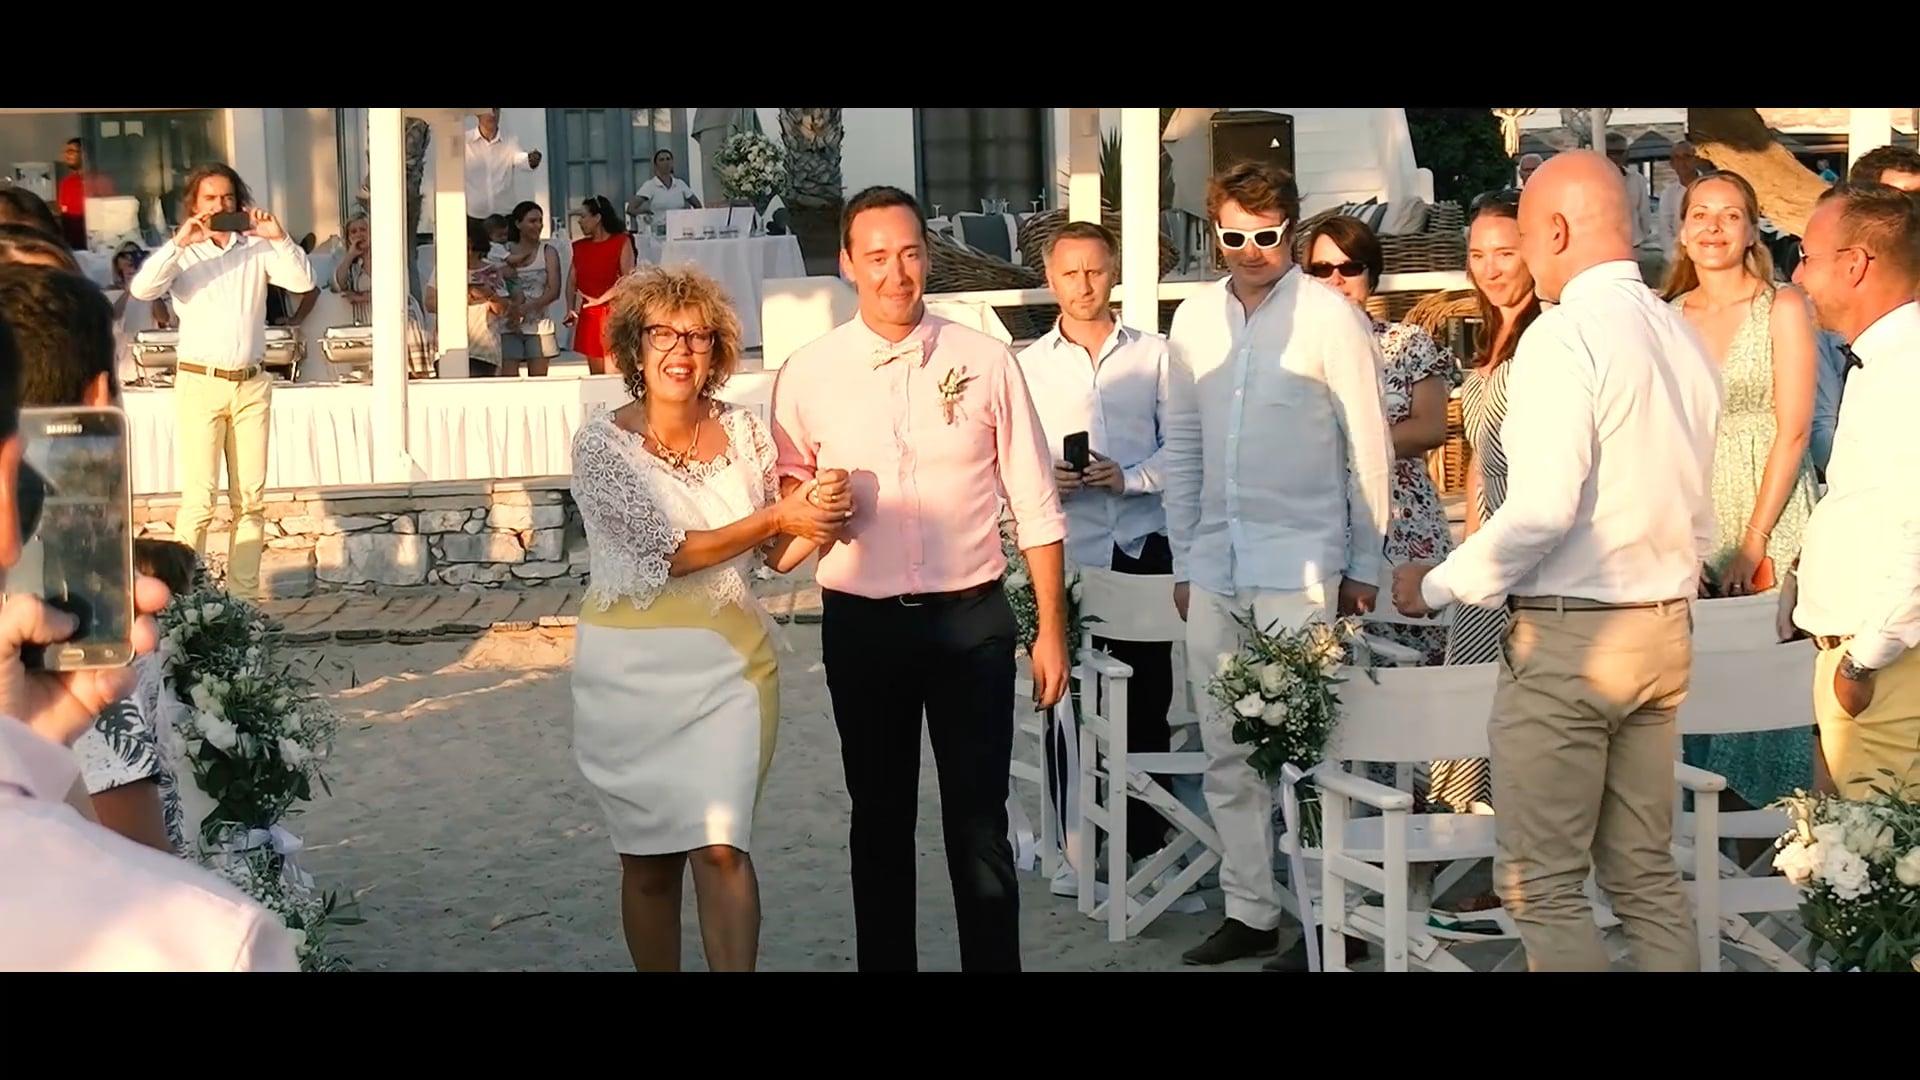 Gay destination wedding (beach party), Mathieu & Nicolas, Naxos island. DJ Nikos Alatas on decks, Teaser video, Epic!